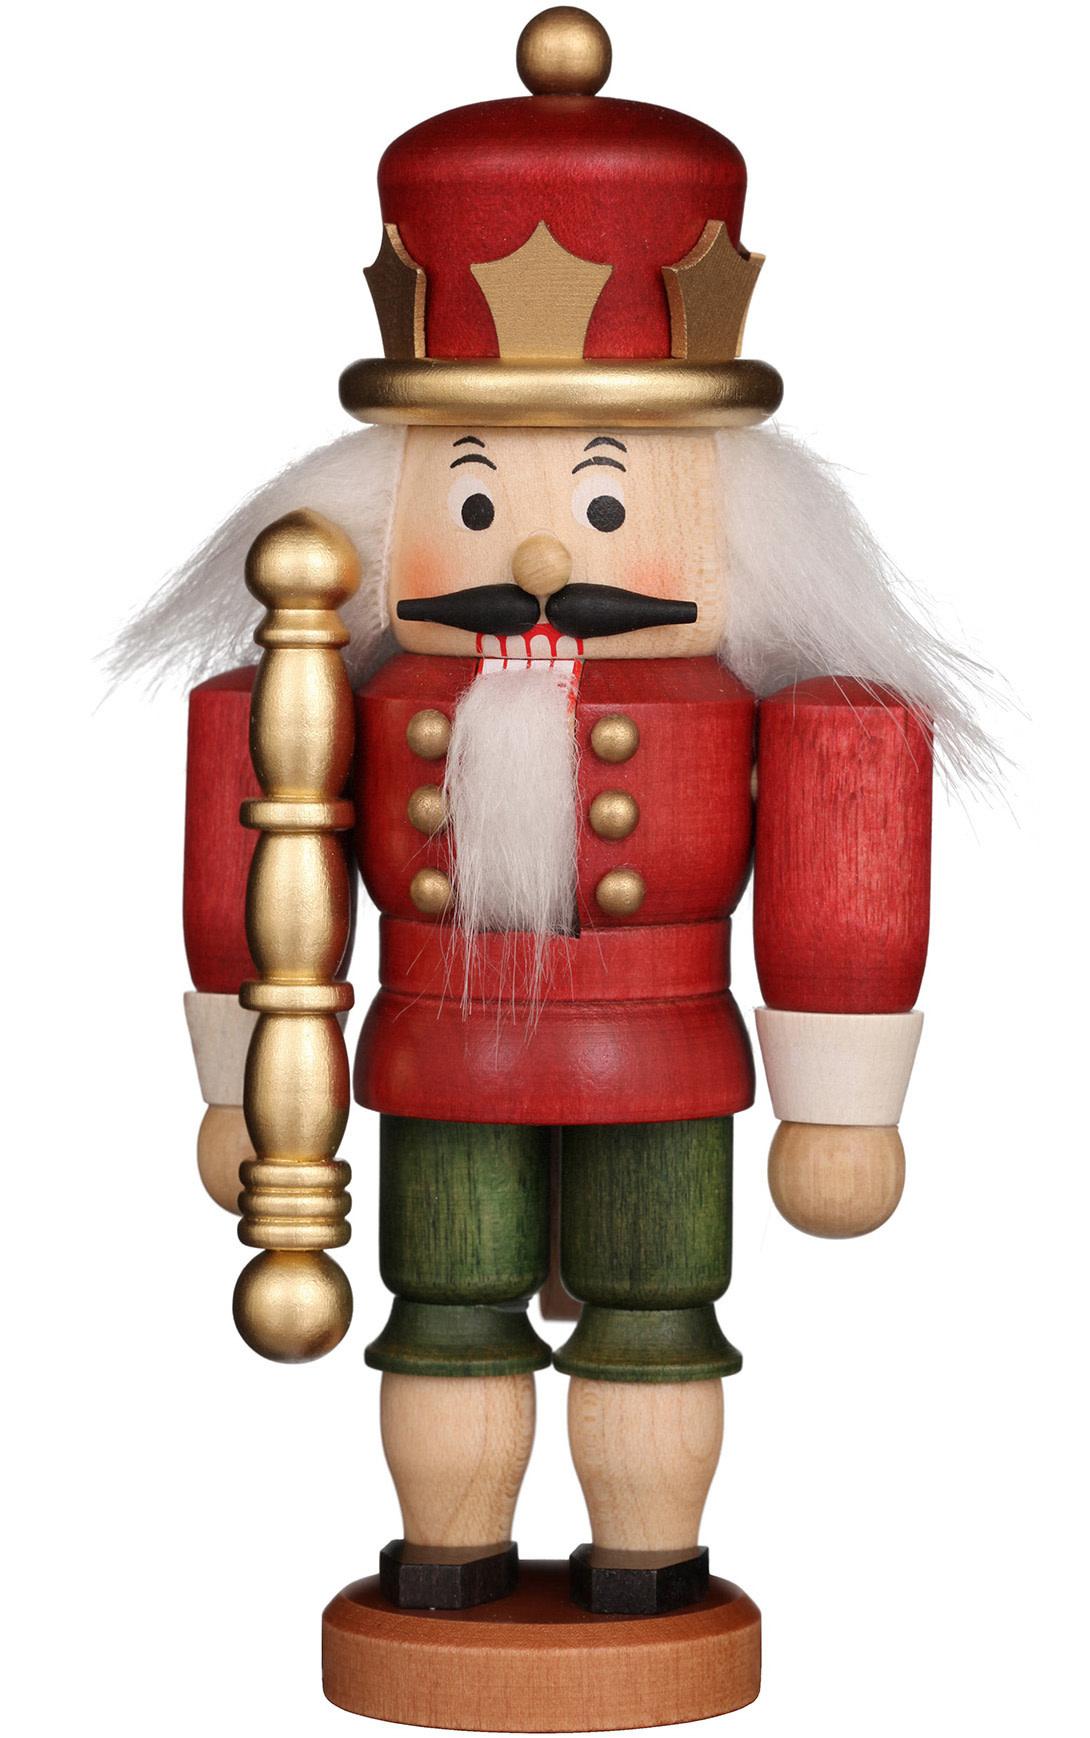 32-610 Red King Nutcracker